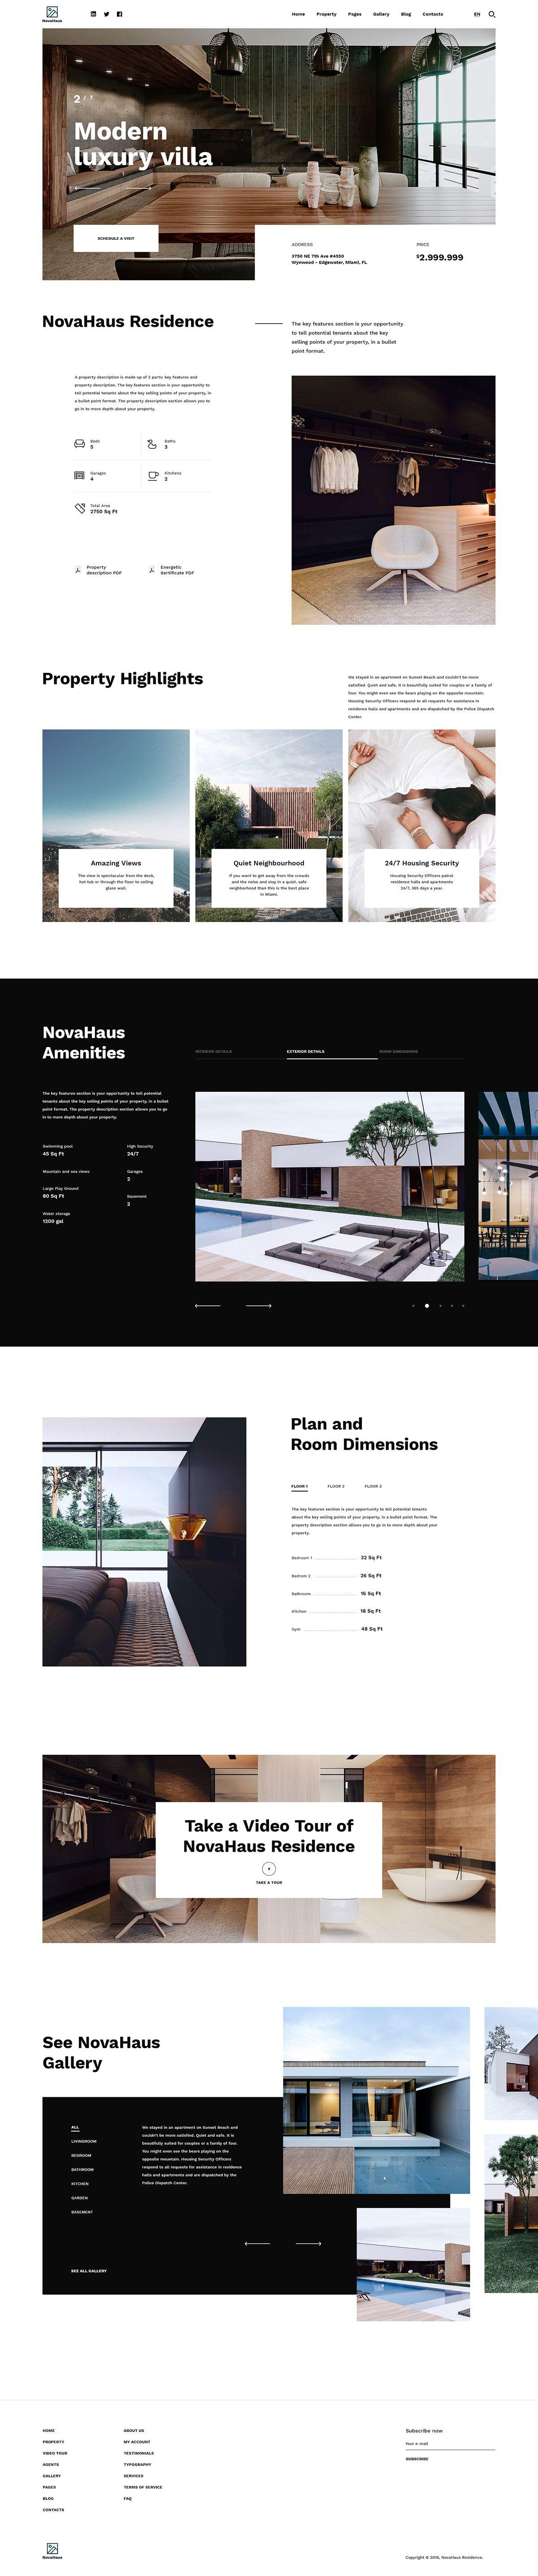 Pin On Web Design Inspiration